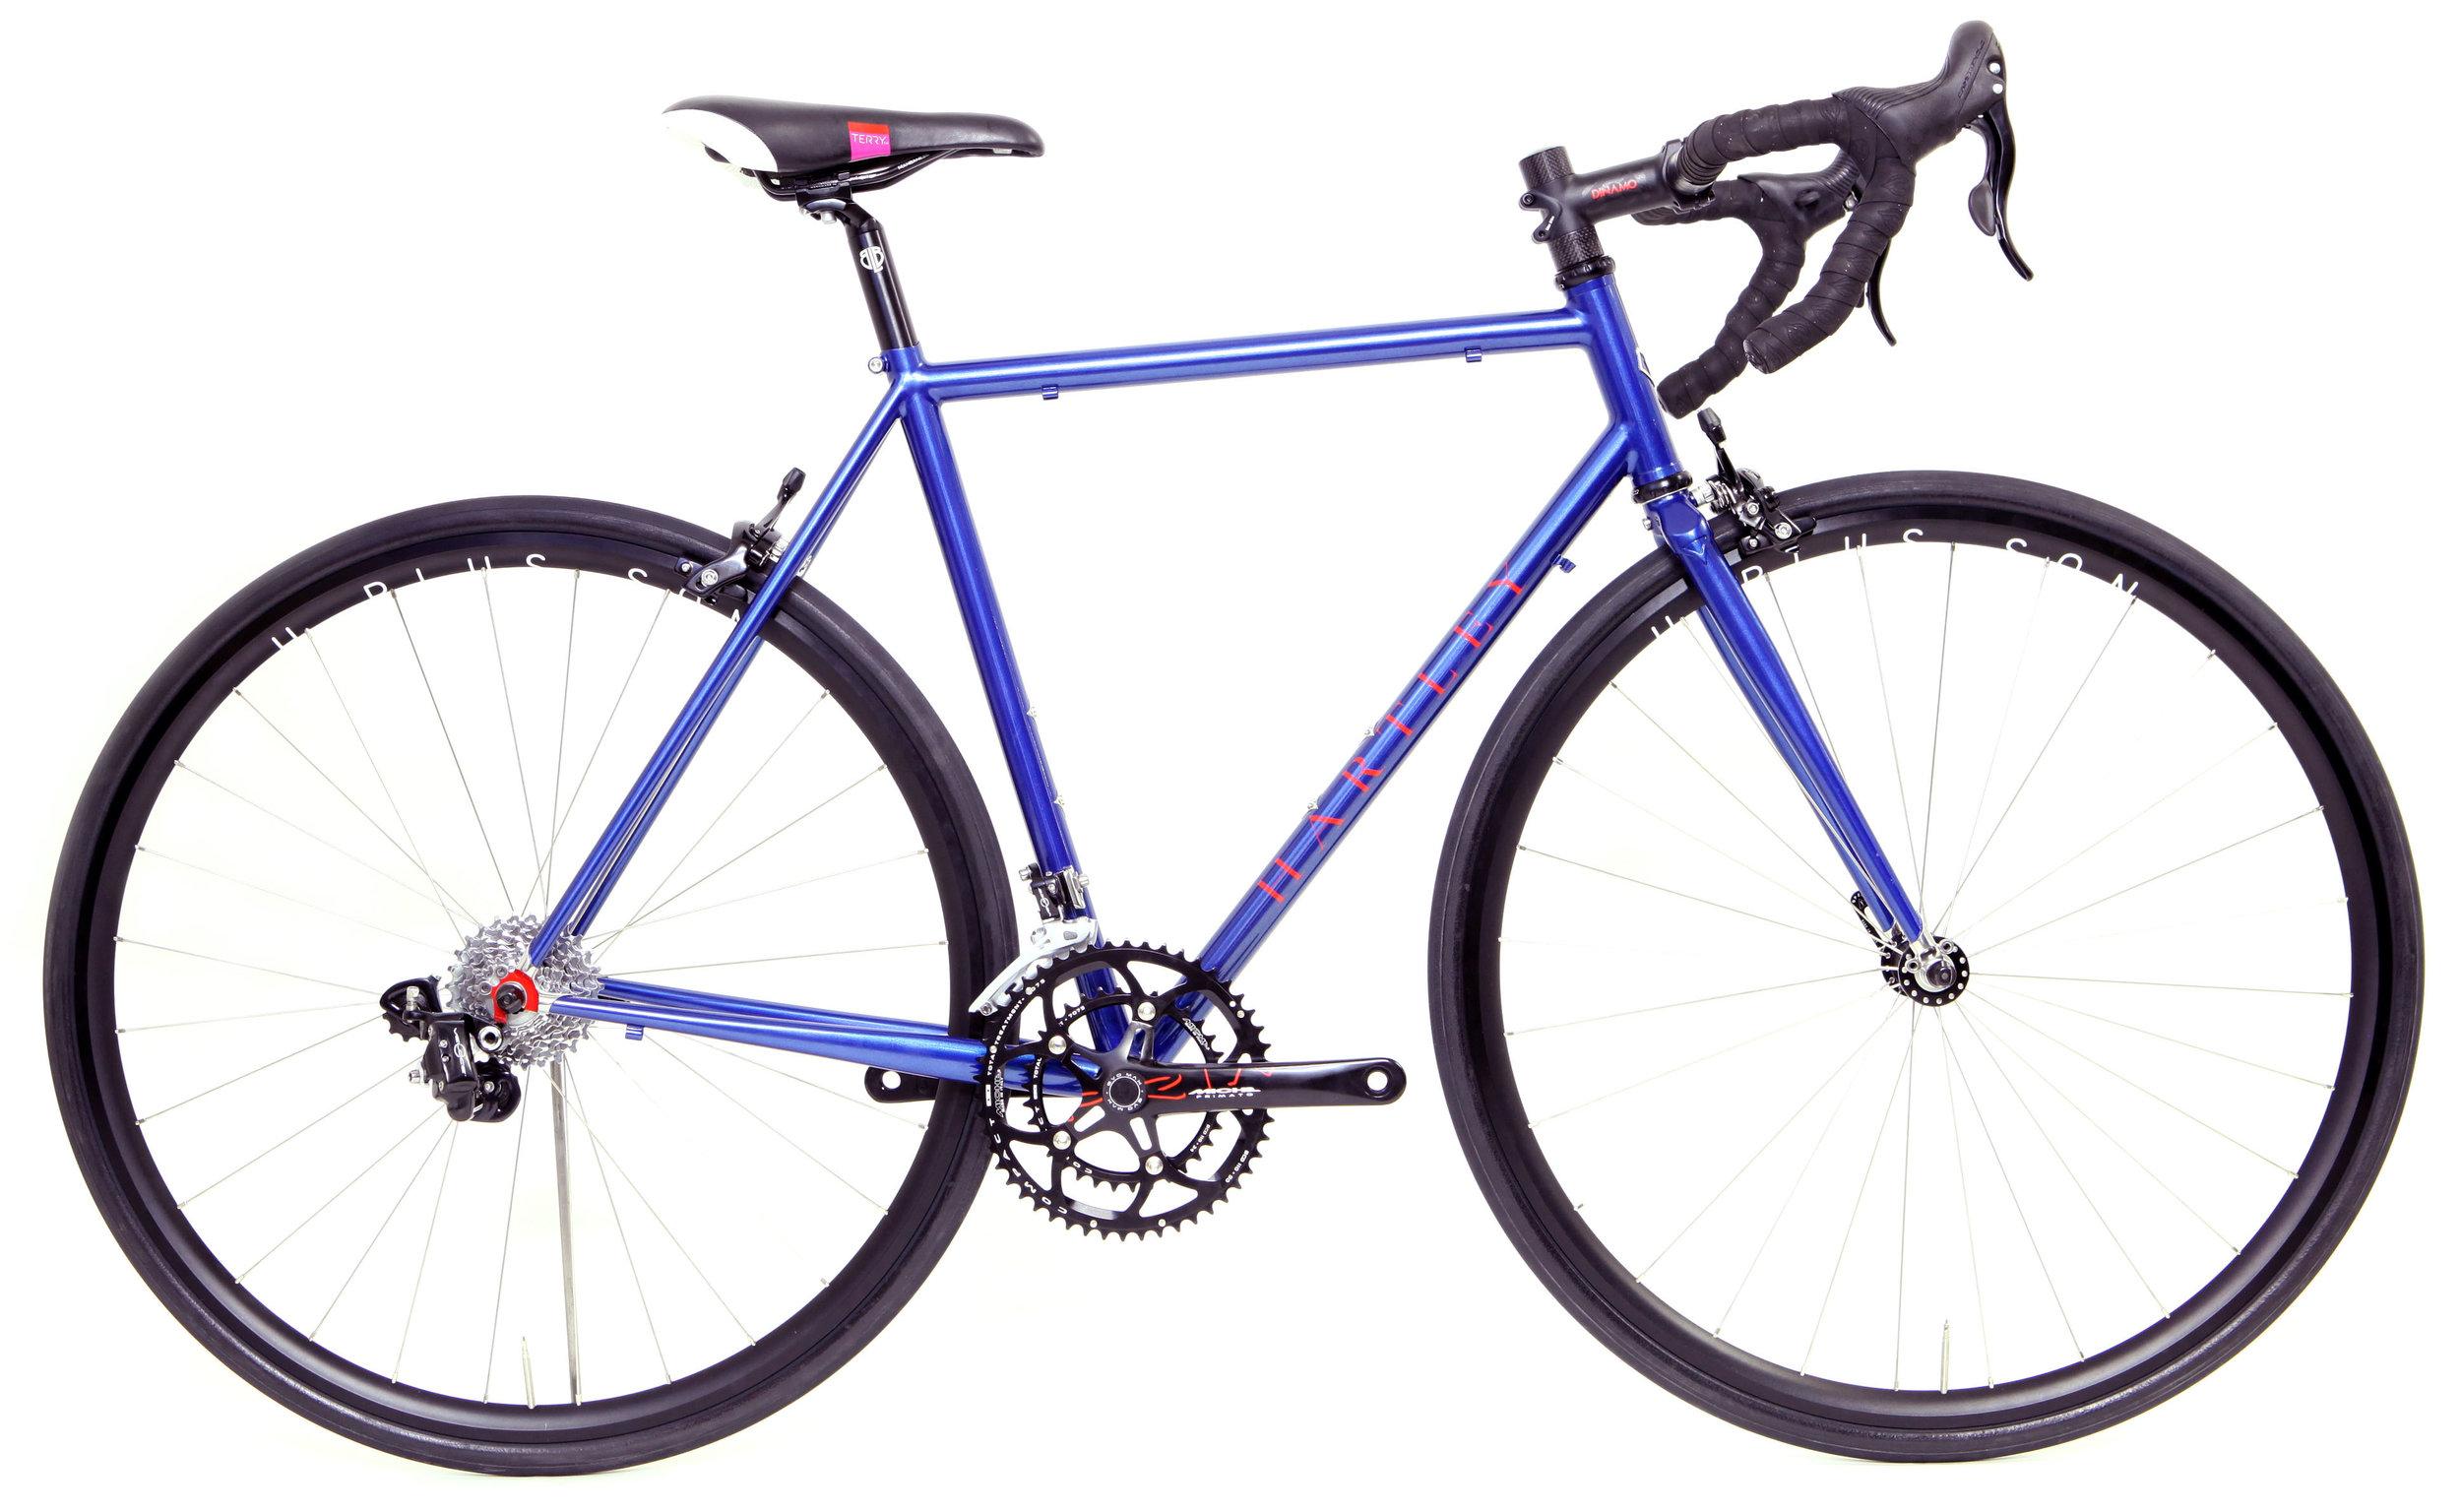 Jenni's bespoke bike - also known as Dirty Diana